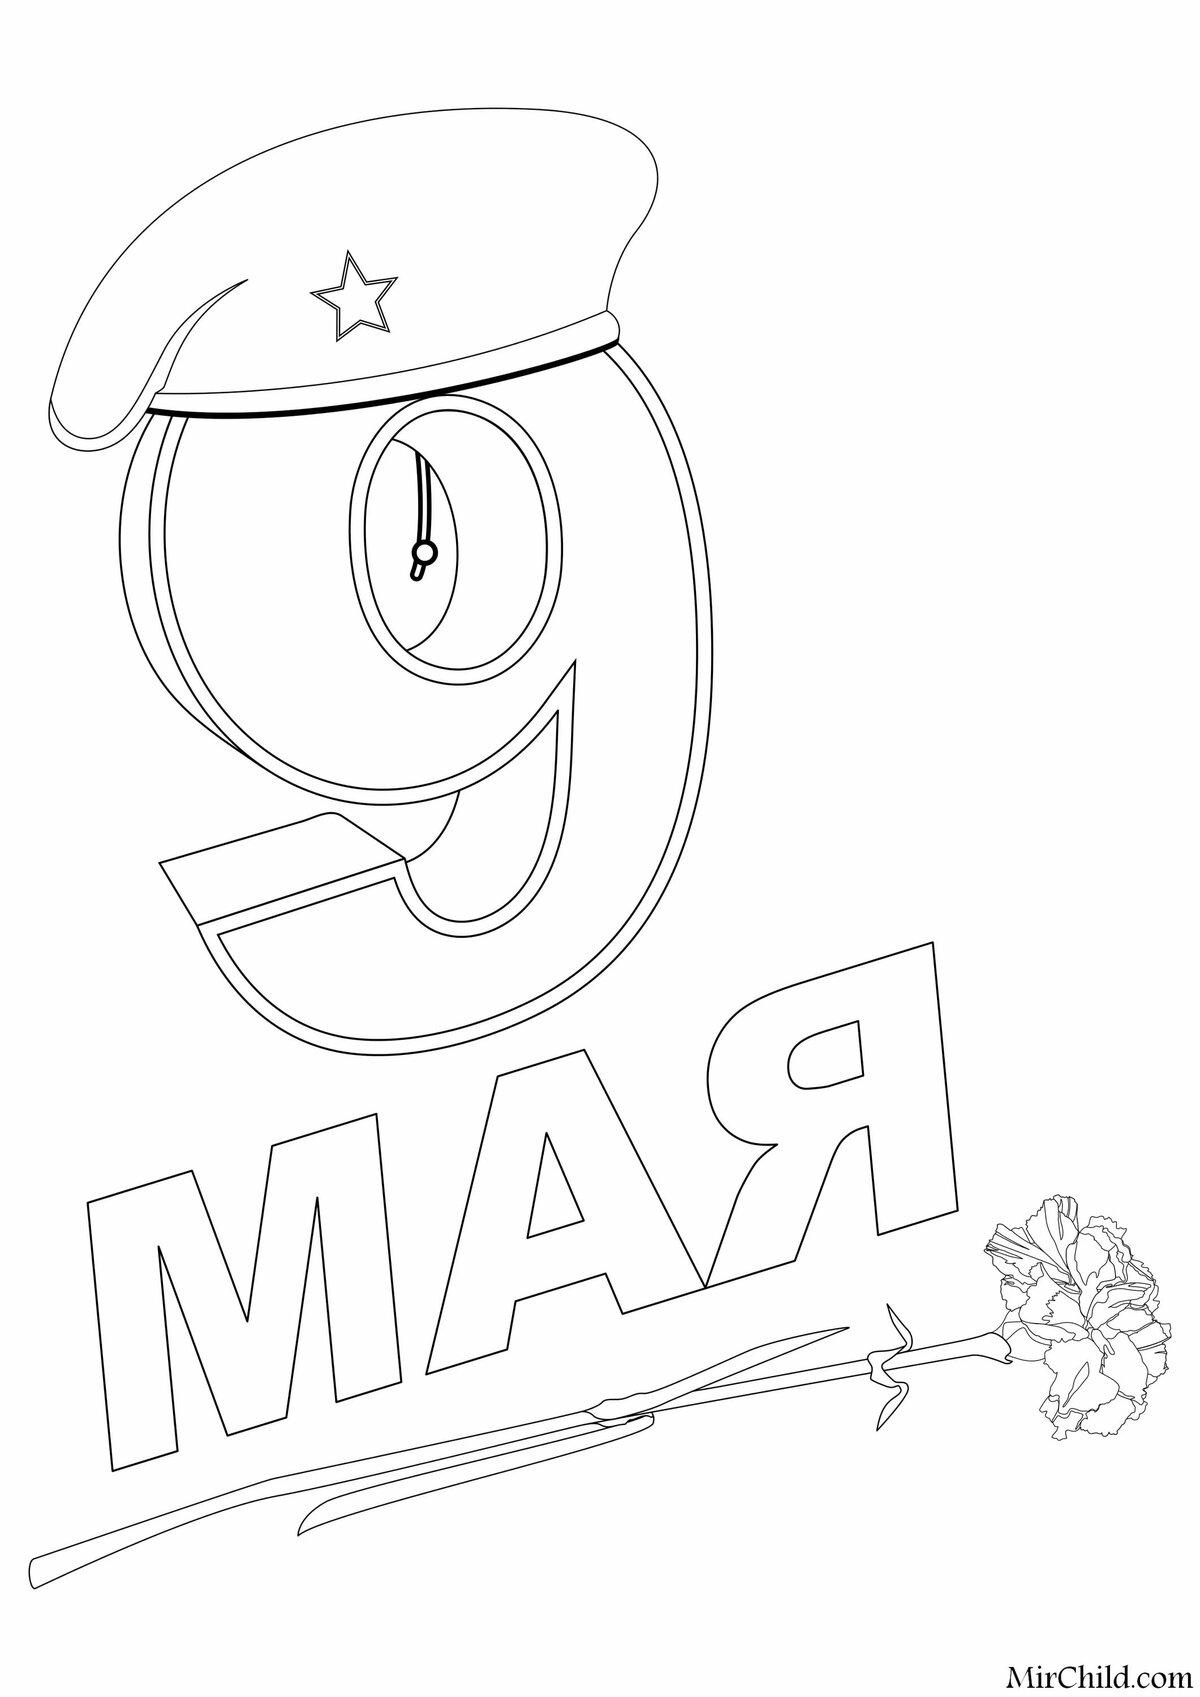 Рисунок раскраска на 9 мая